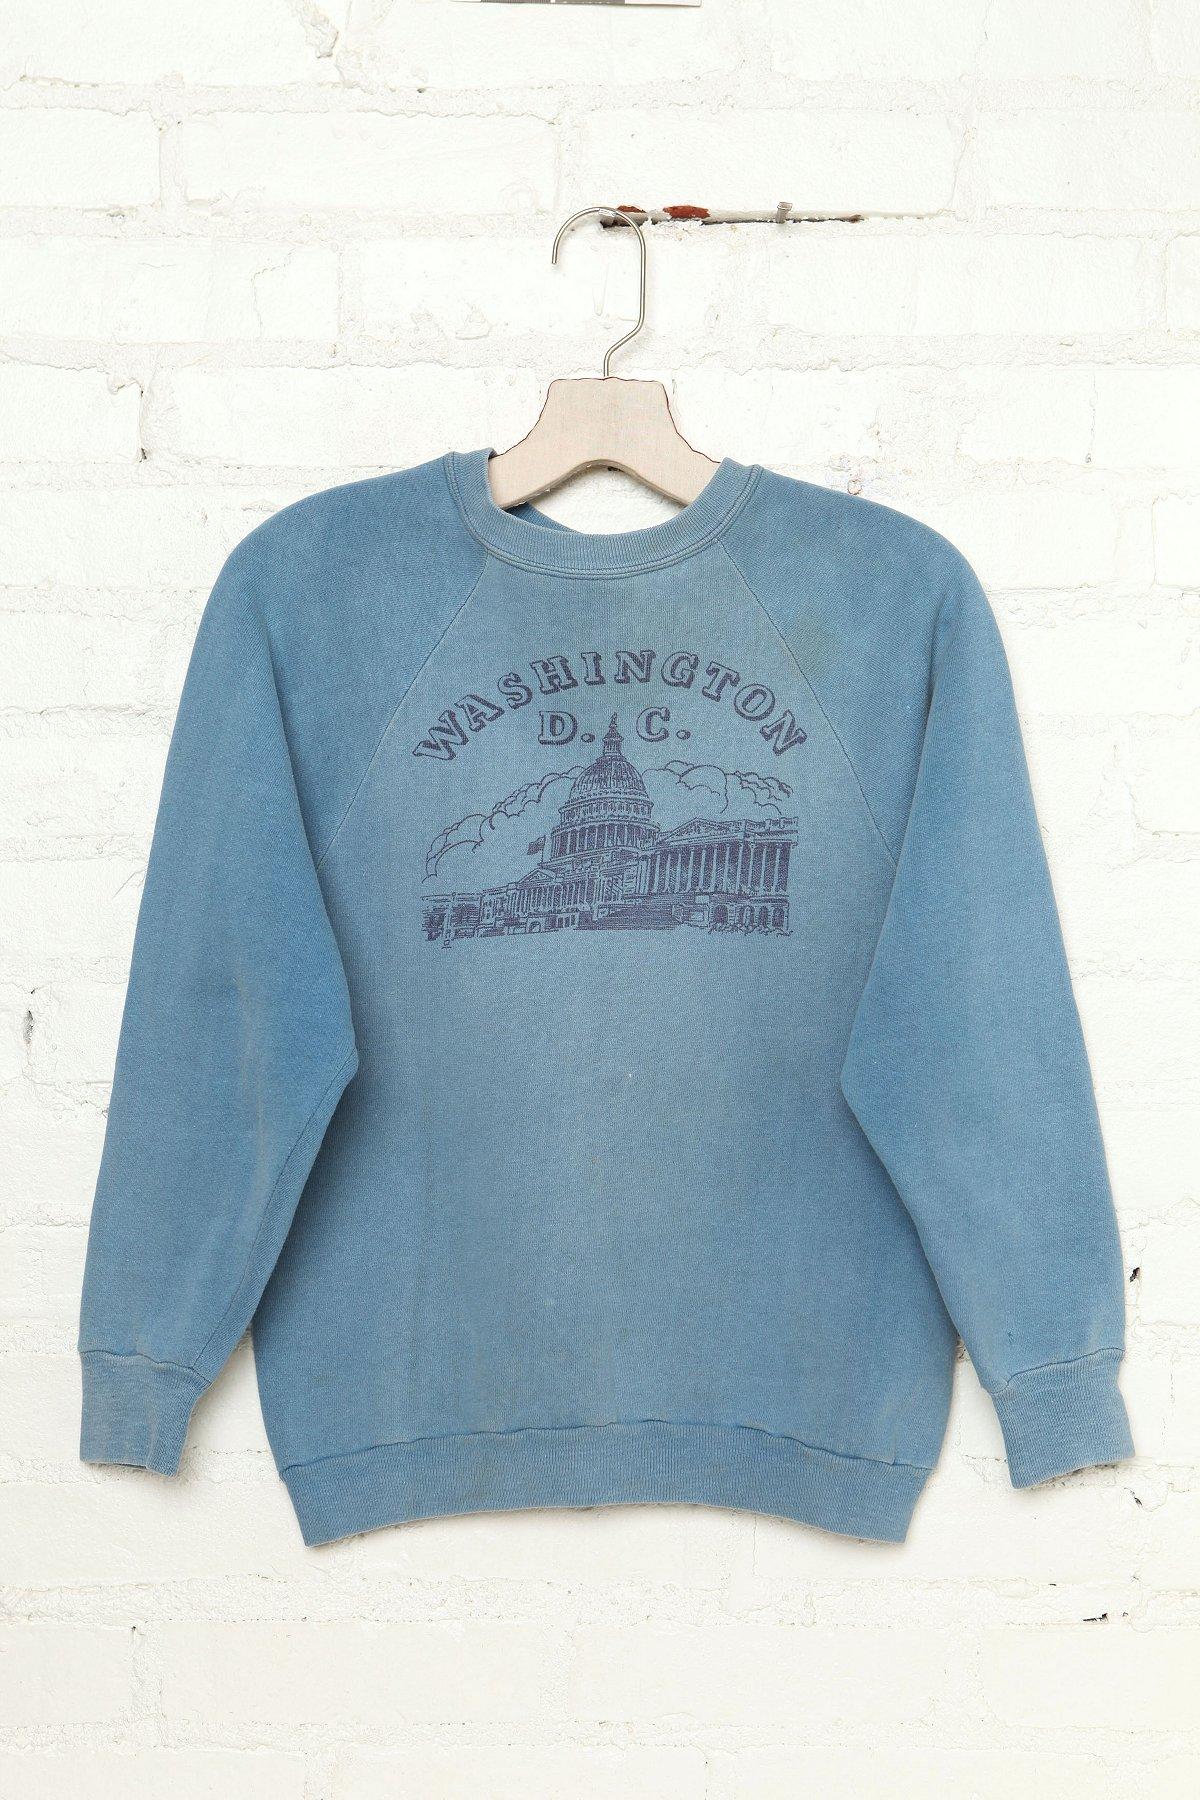 Vintage Washington D.C. Sweatshirt